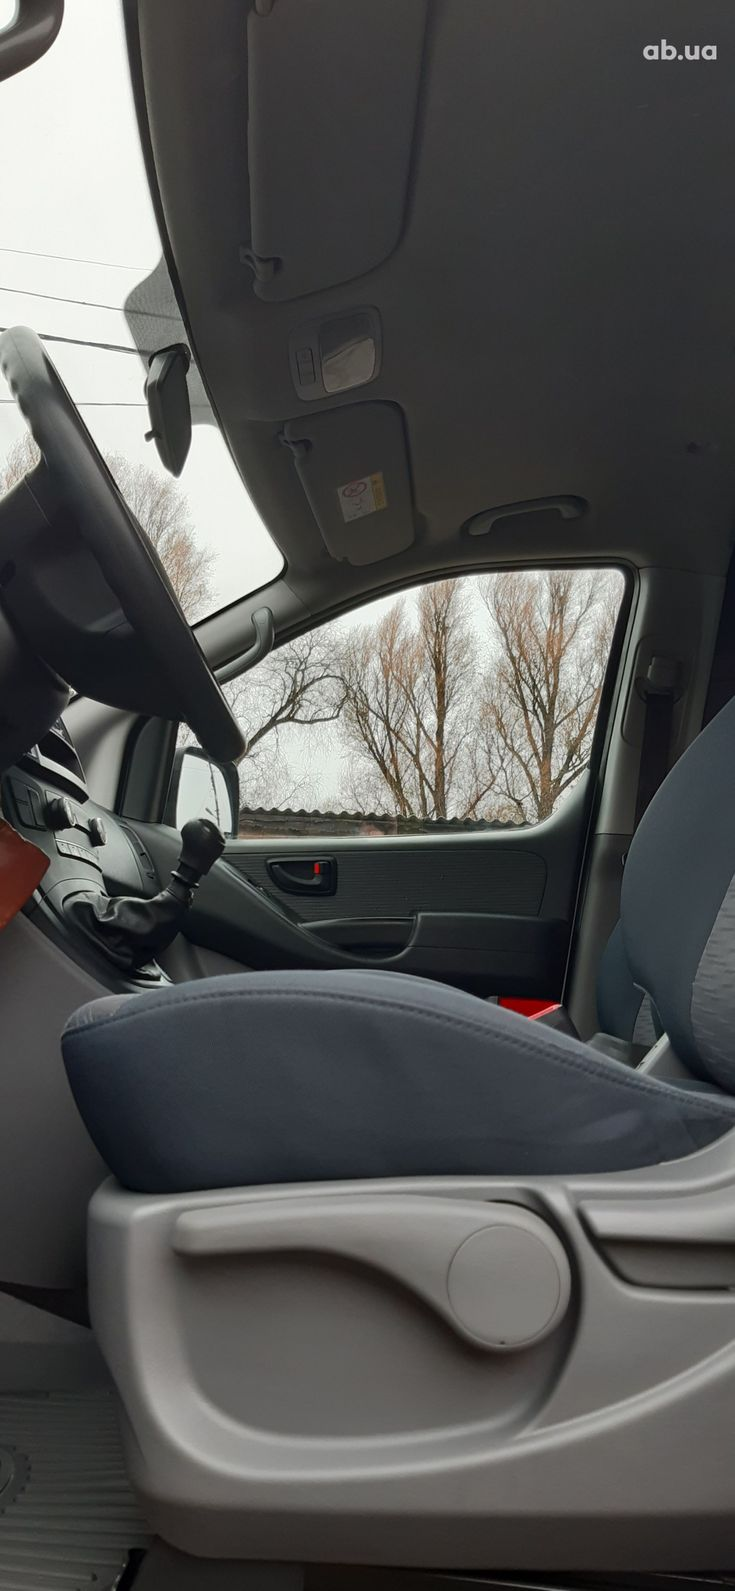 Hyundai H-1 2016 белый - фото 6